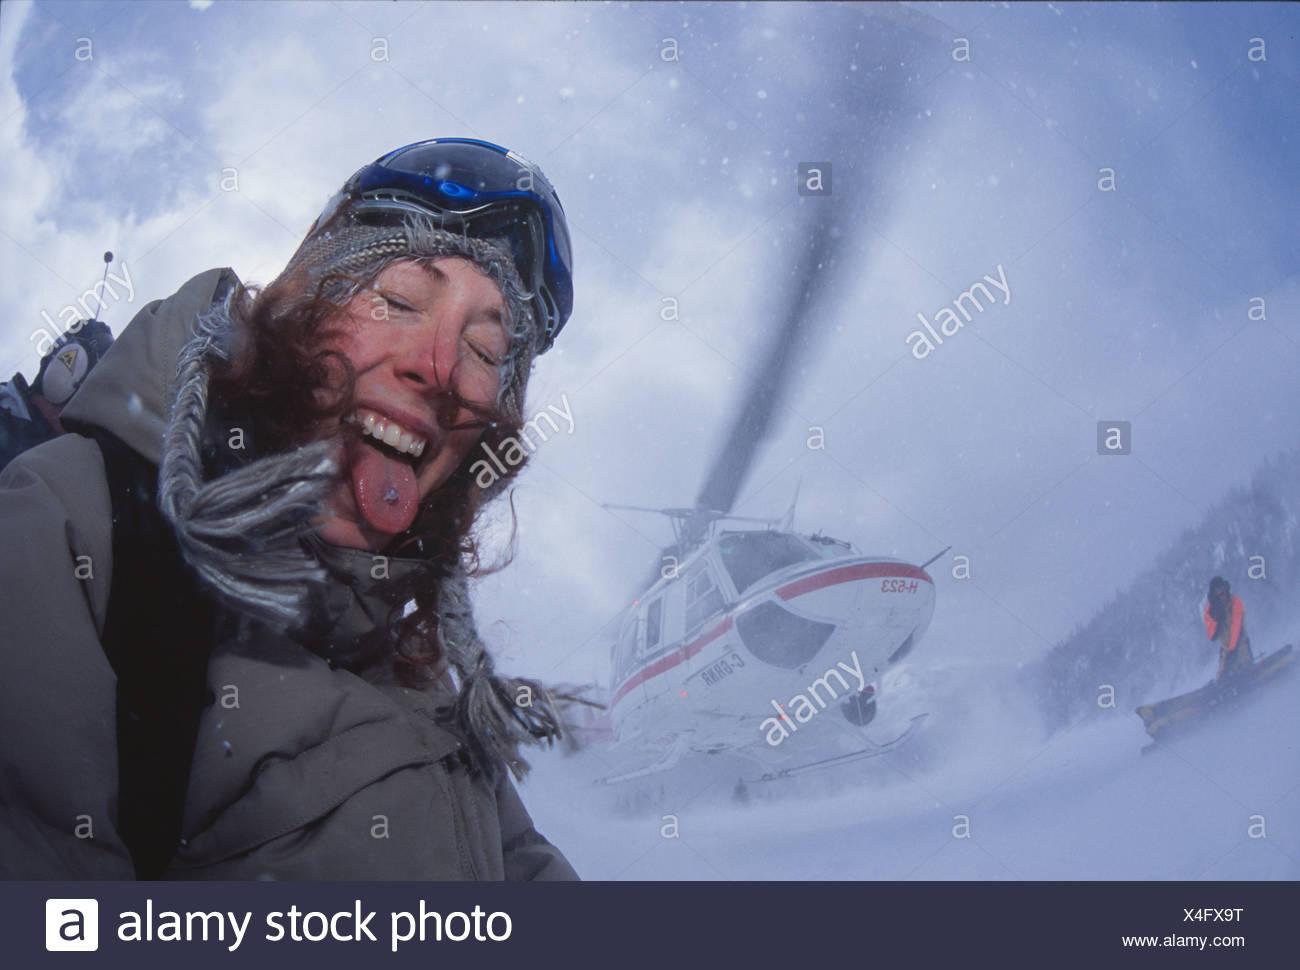 Heli-skier with pierced tounge, Bugaboos, BC. - Stock Image